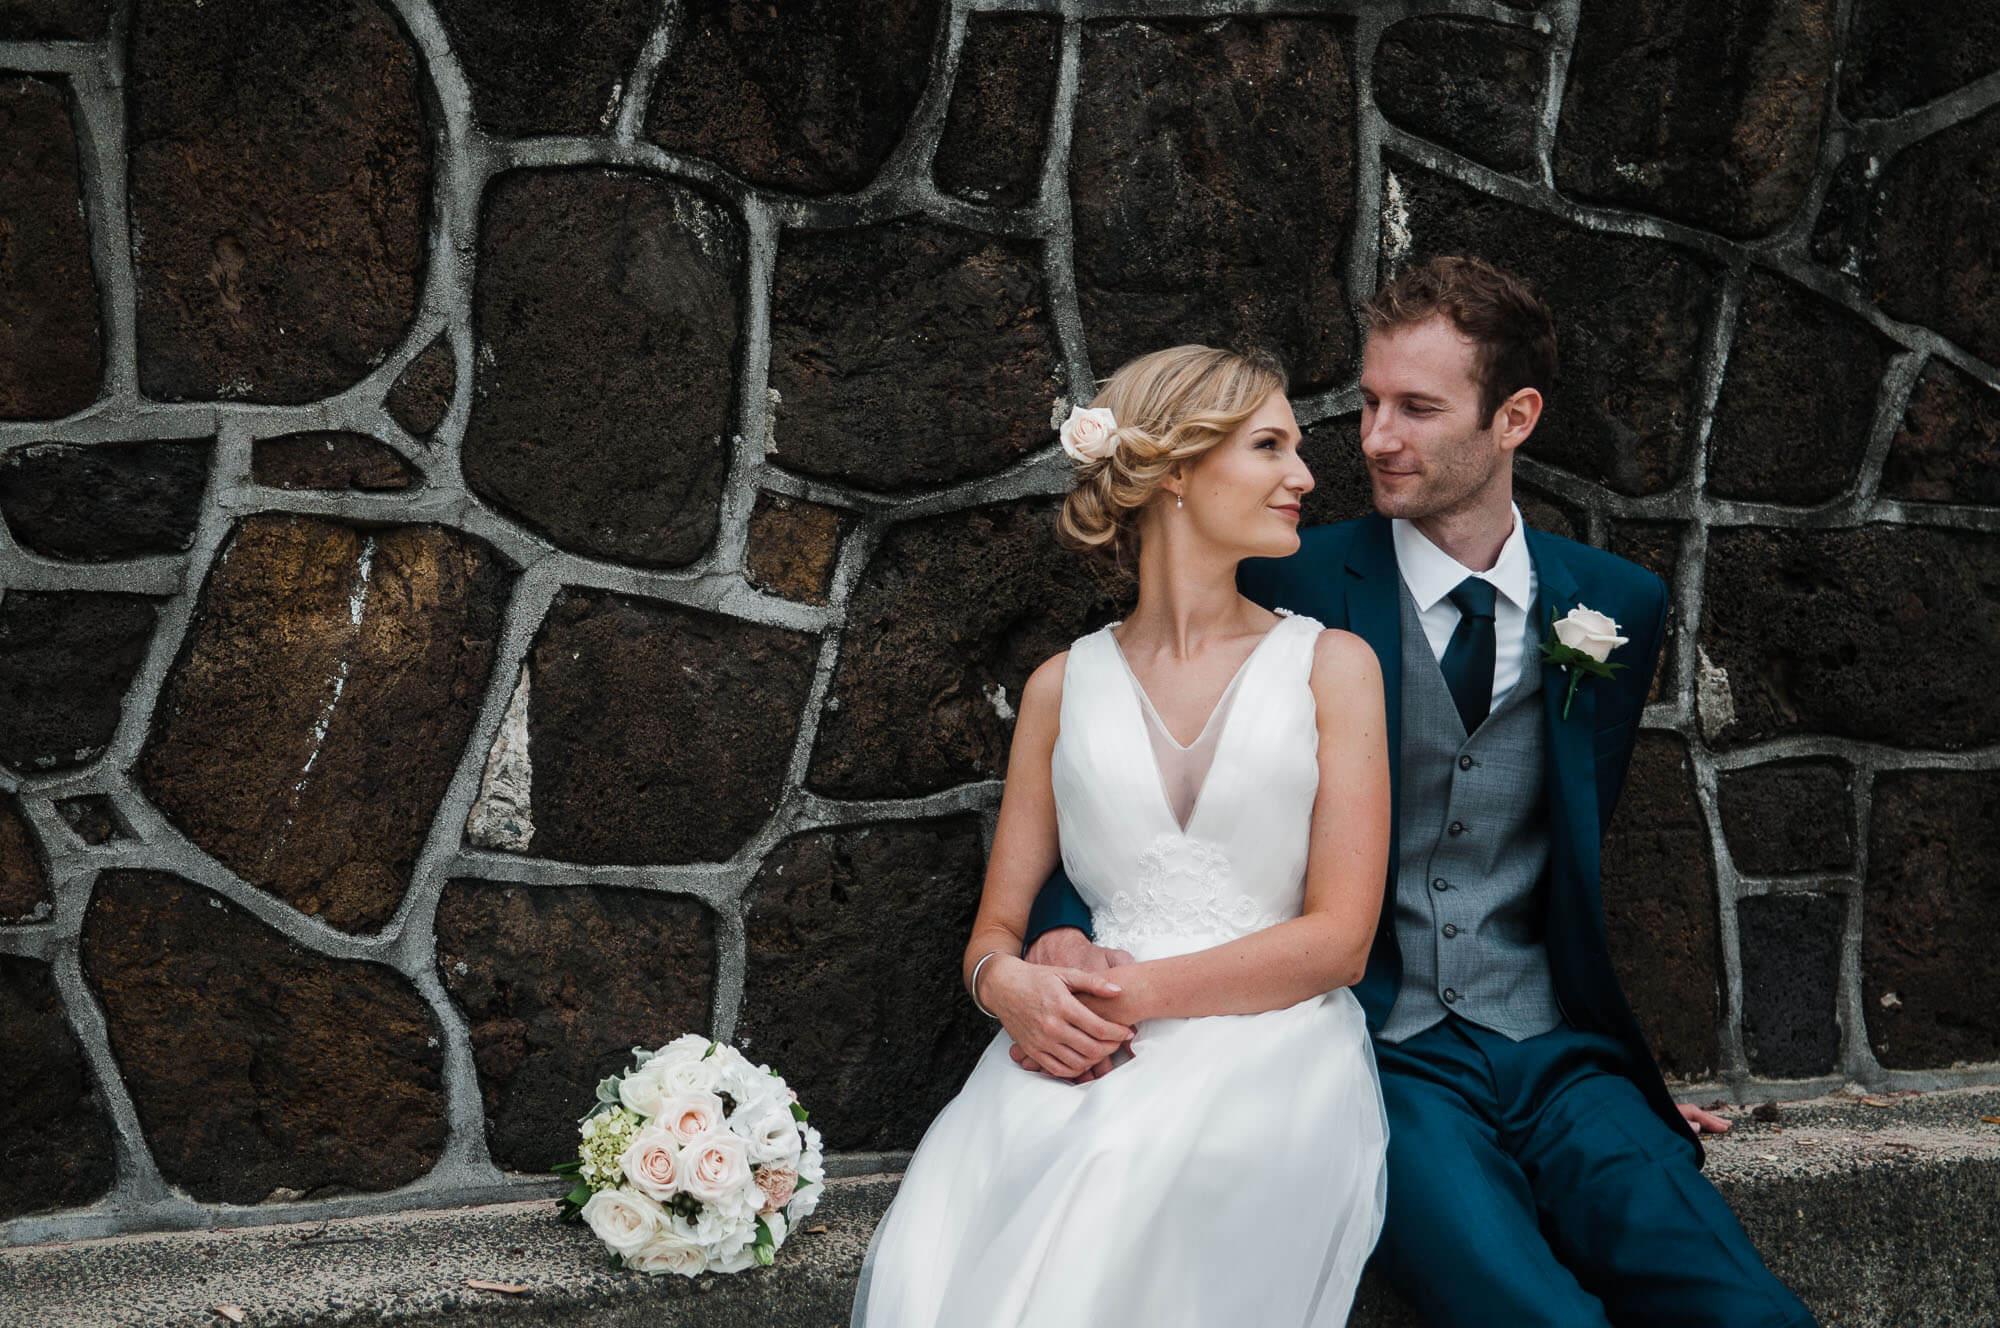 bride-and-groom-sitting-on-wall.jpg